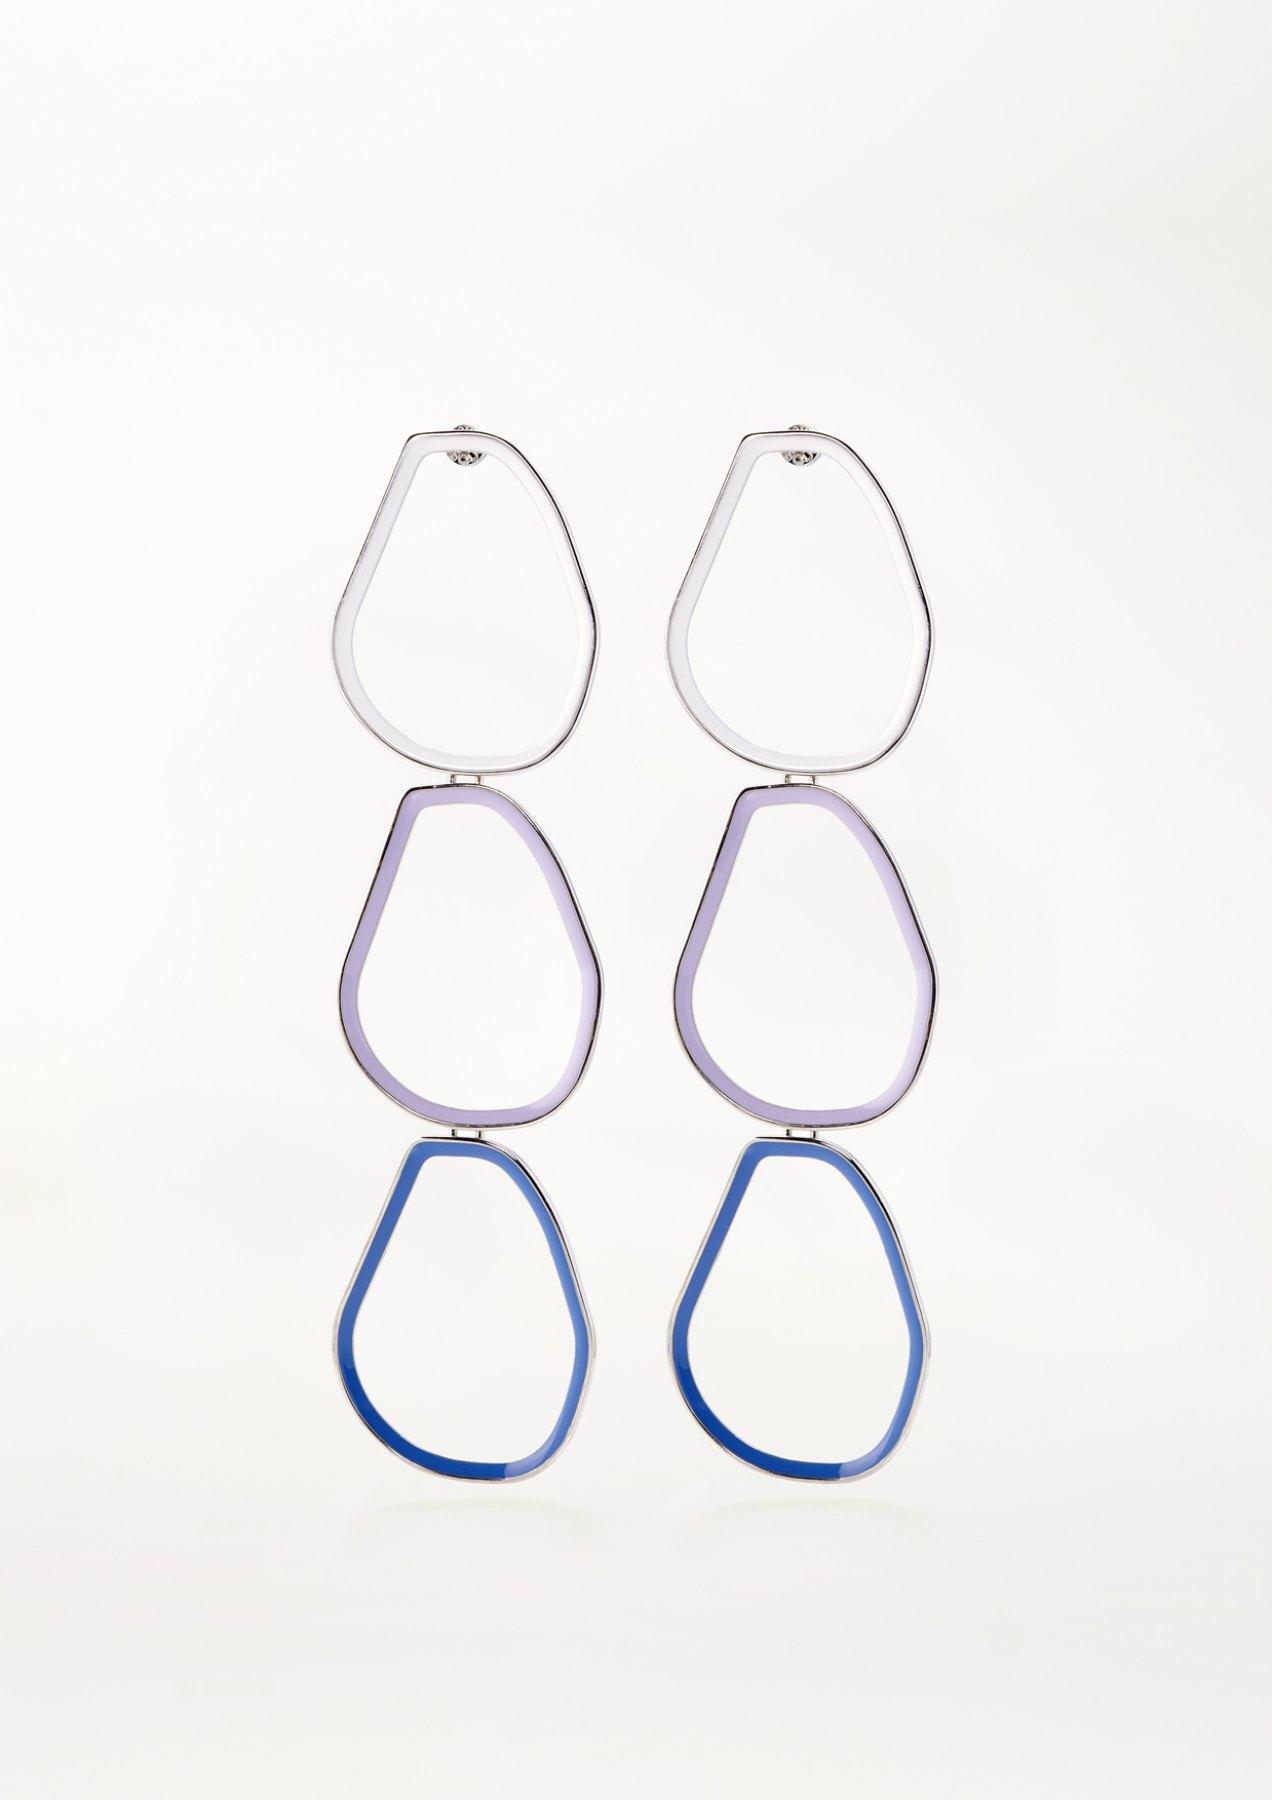 xenia bous jewellery coloured stone 05 earrings multicolour white lilac blue